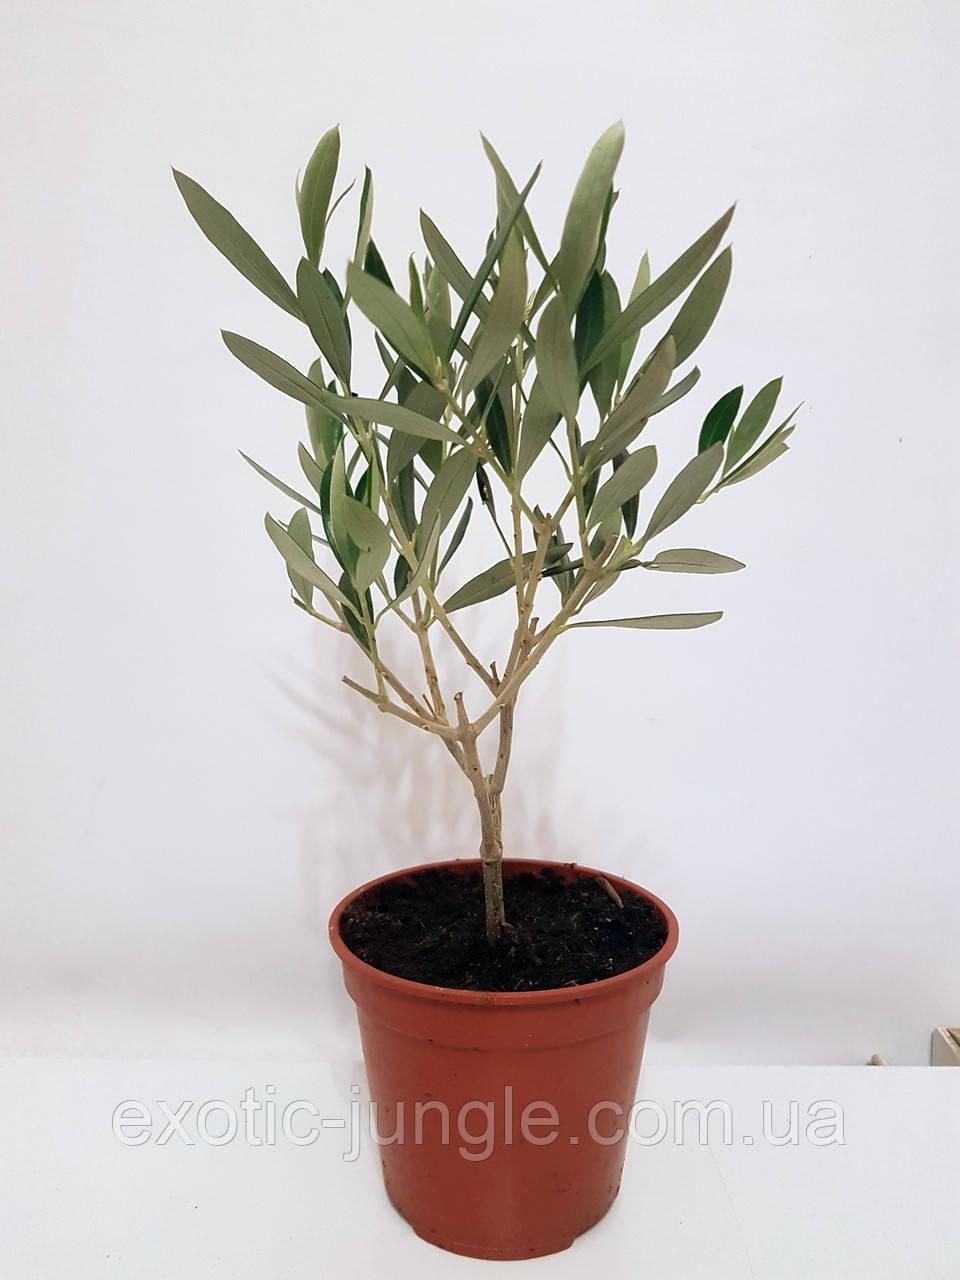 Олива европейская (Olea europaea) 50-60 см. Комнатная (Италия)